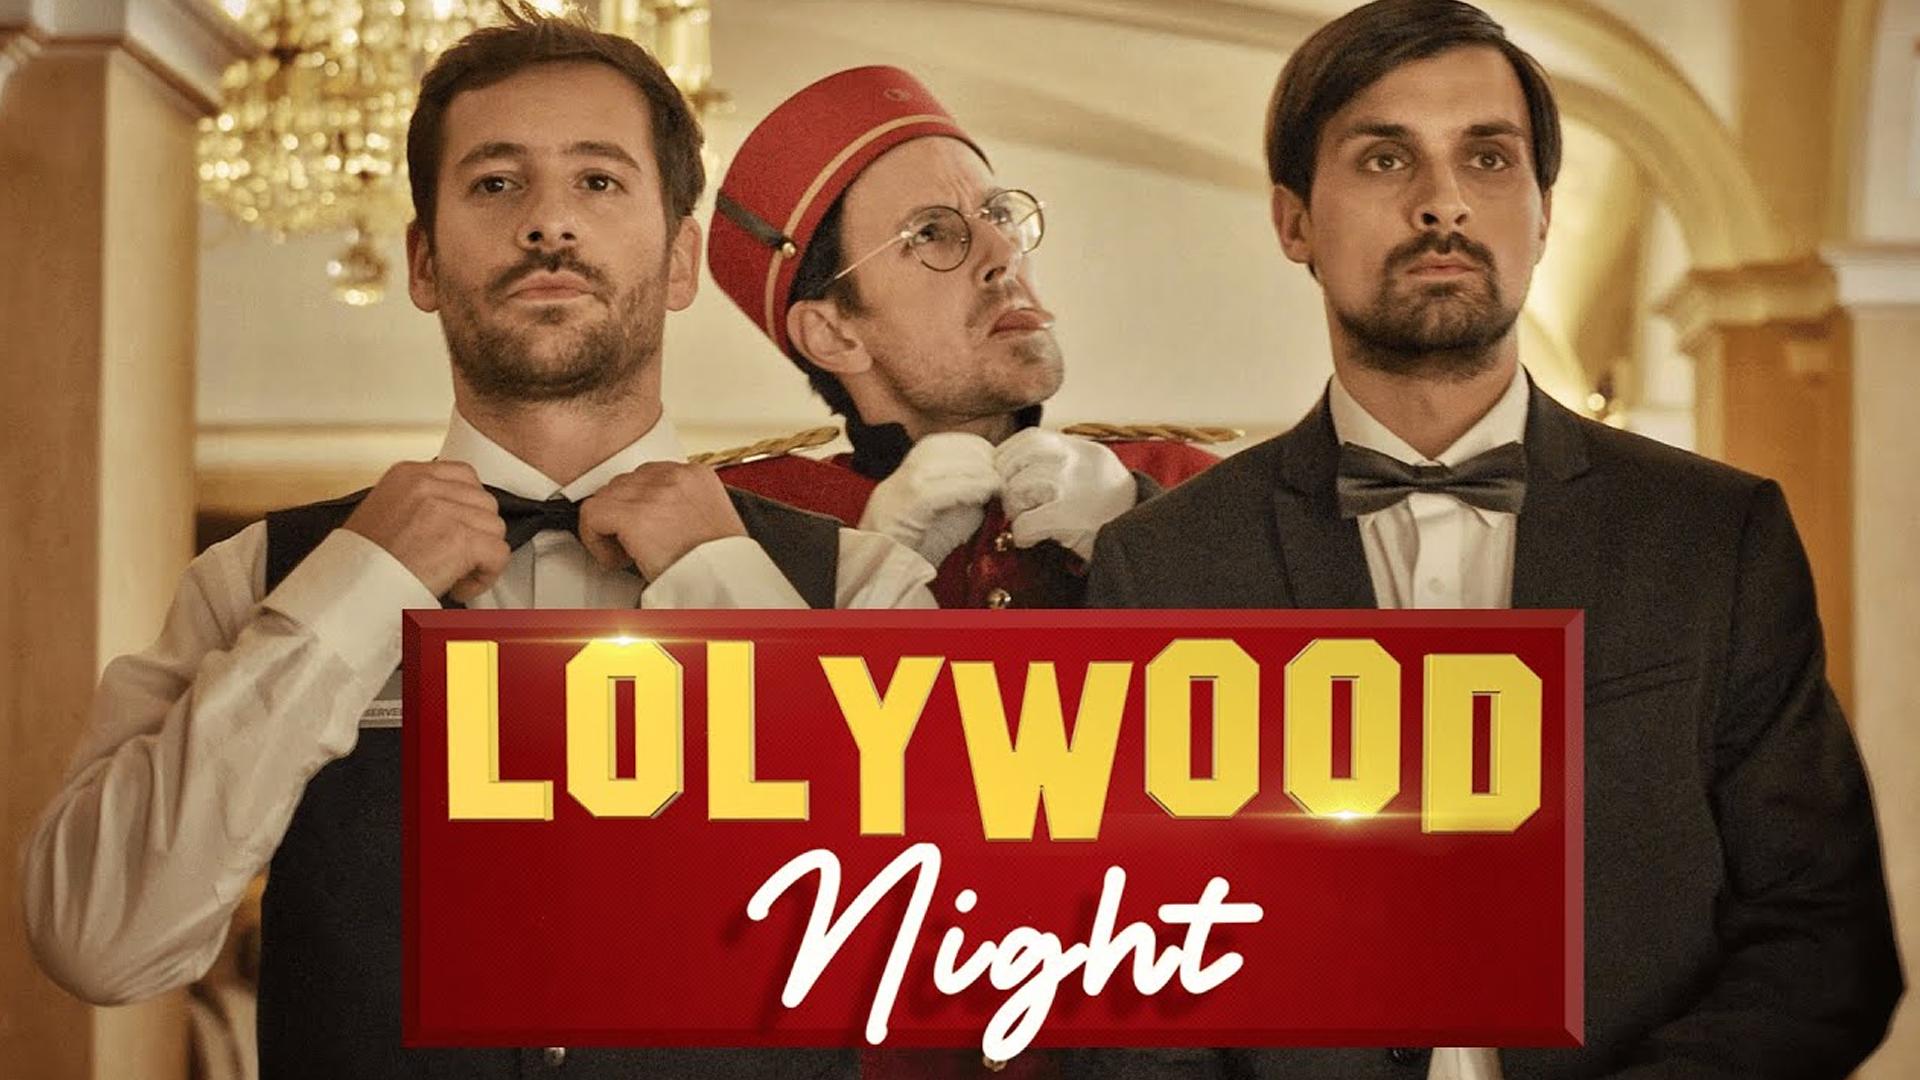 Lolywood Night